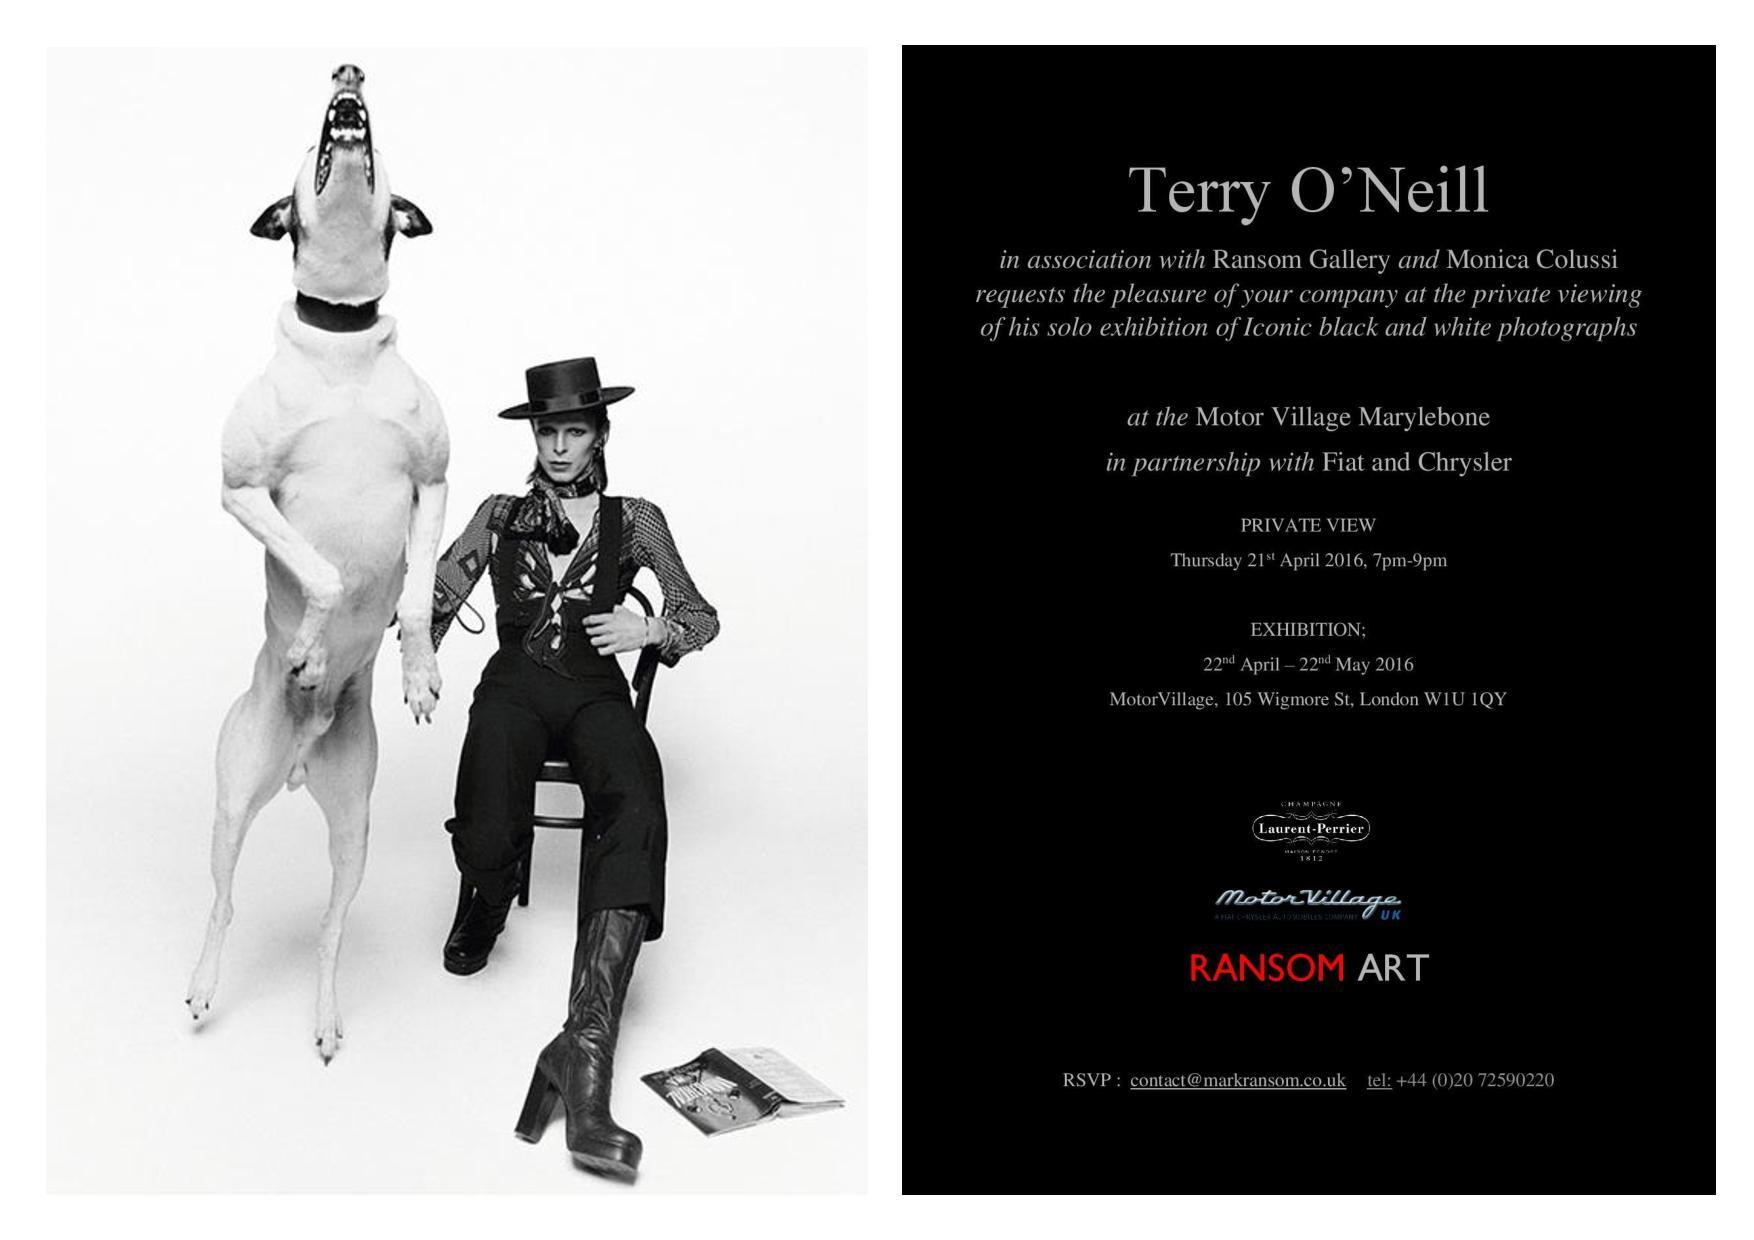 invitation-terry-o-neill-solo-exhibition-motovillageuk-ransom-art-gallery